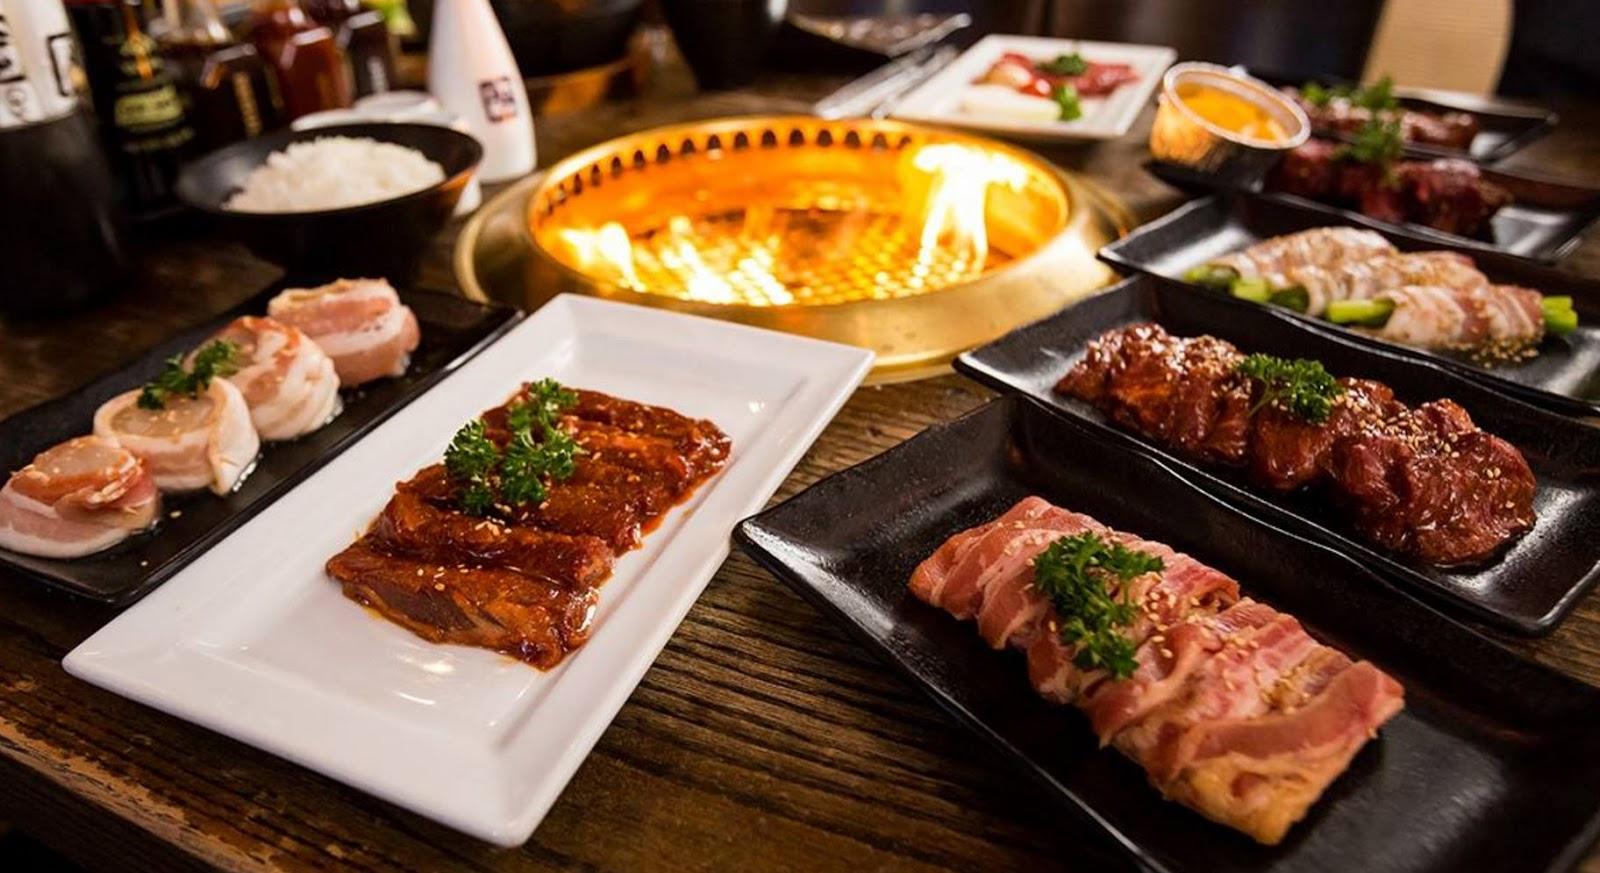 Nov. 1 - Feb 28 | All You Can Eat Menu Is Back At Gyu-Kaku Japanese BBQ